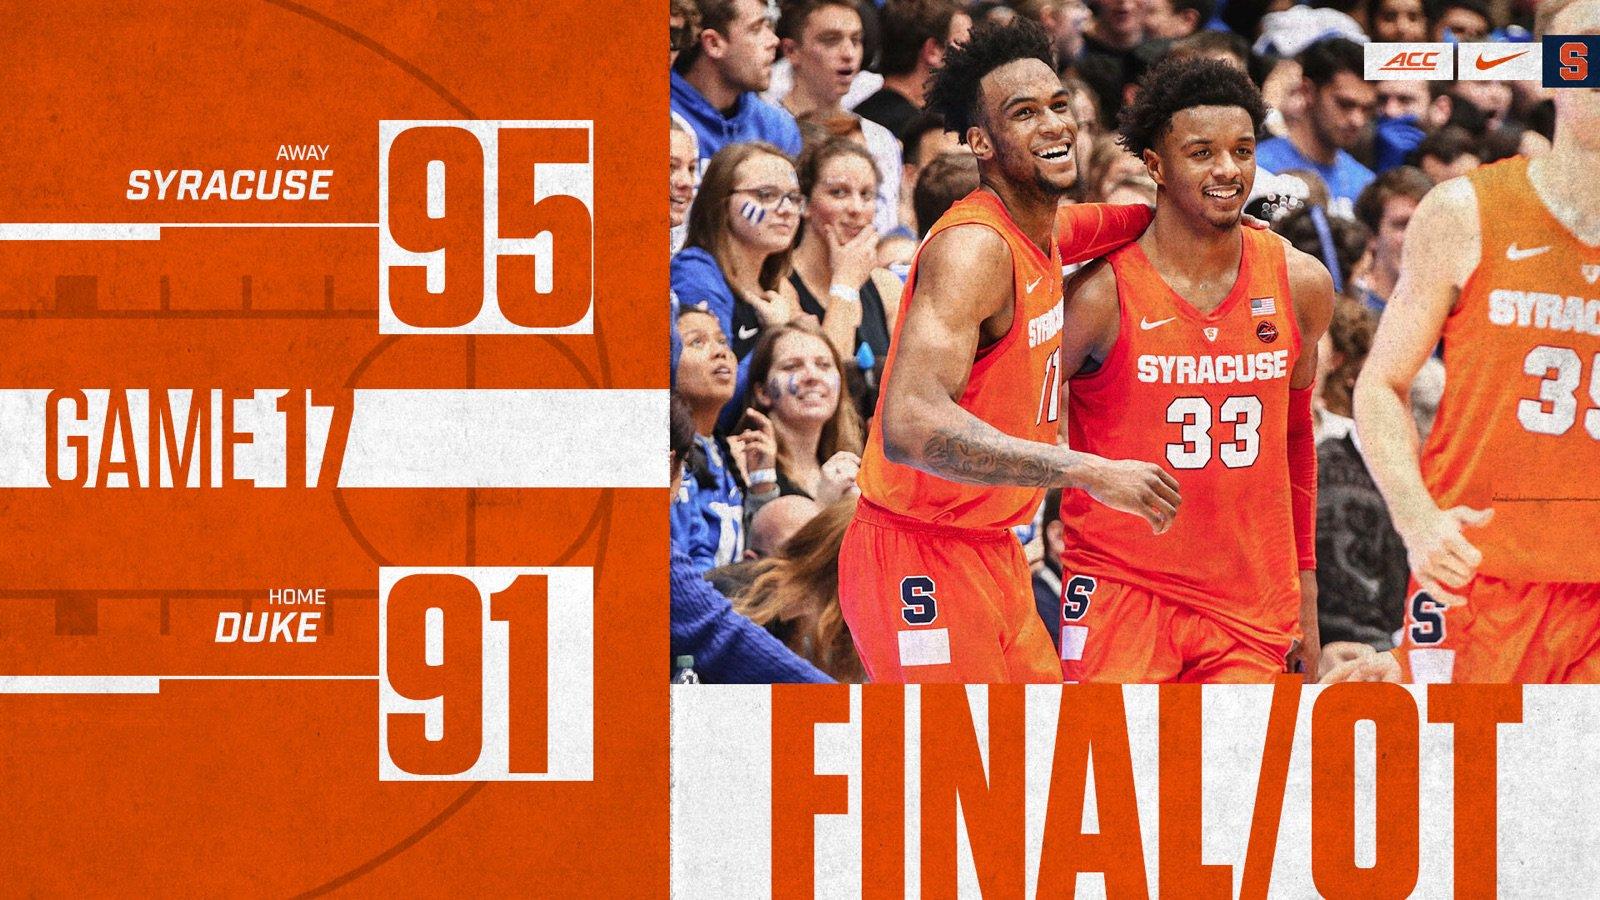 Syracuse Basketball On Twitter Final The Orange Take Down No 1